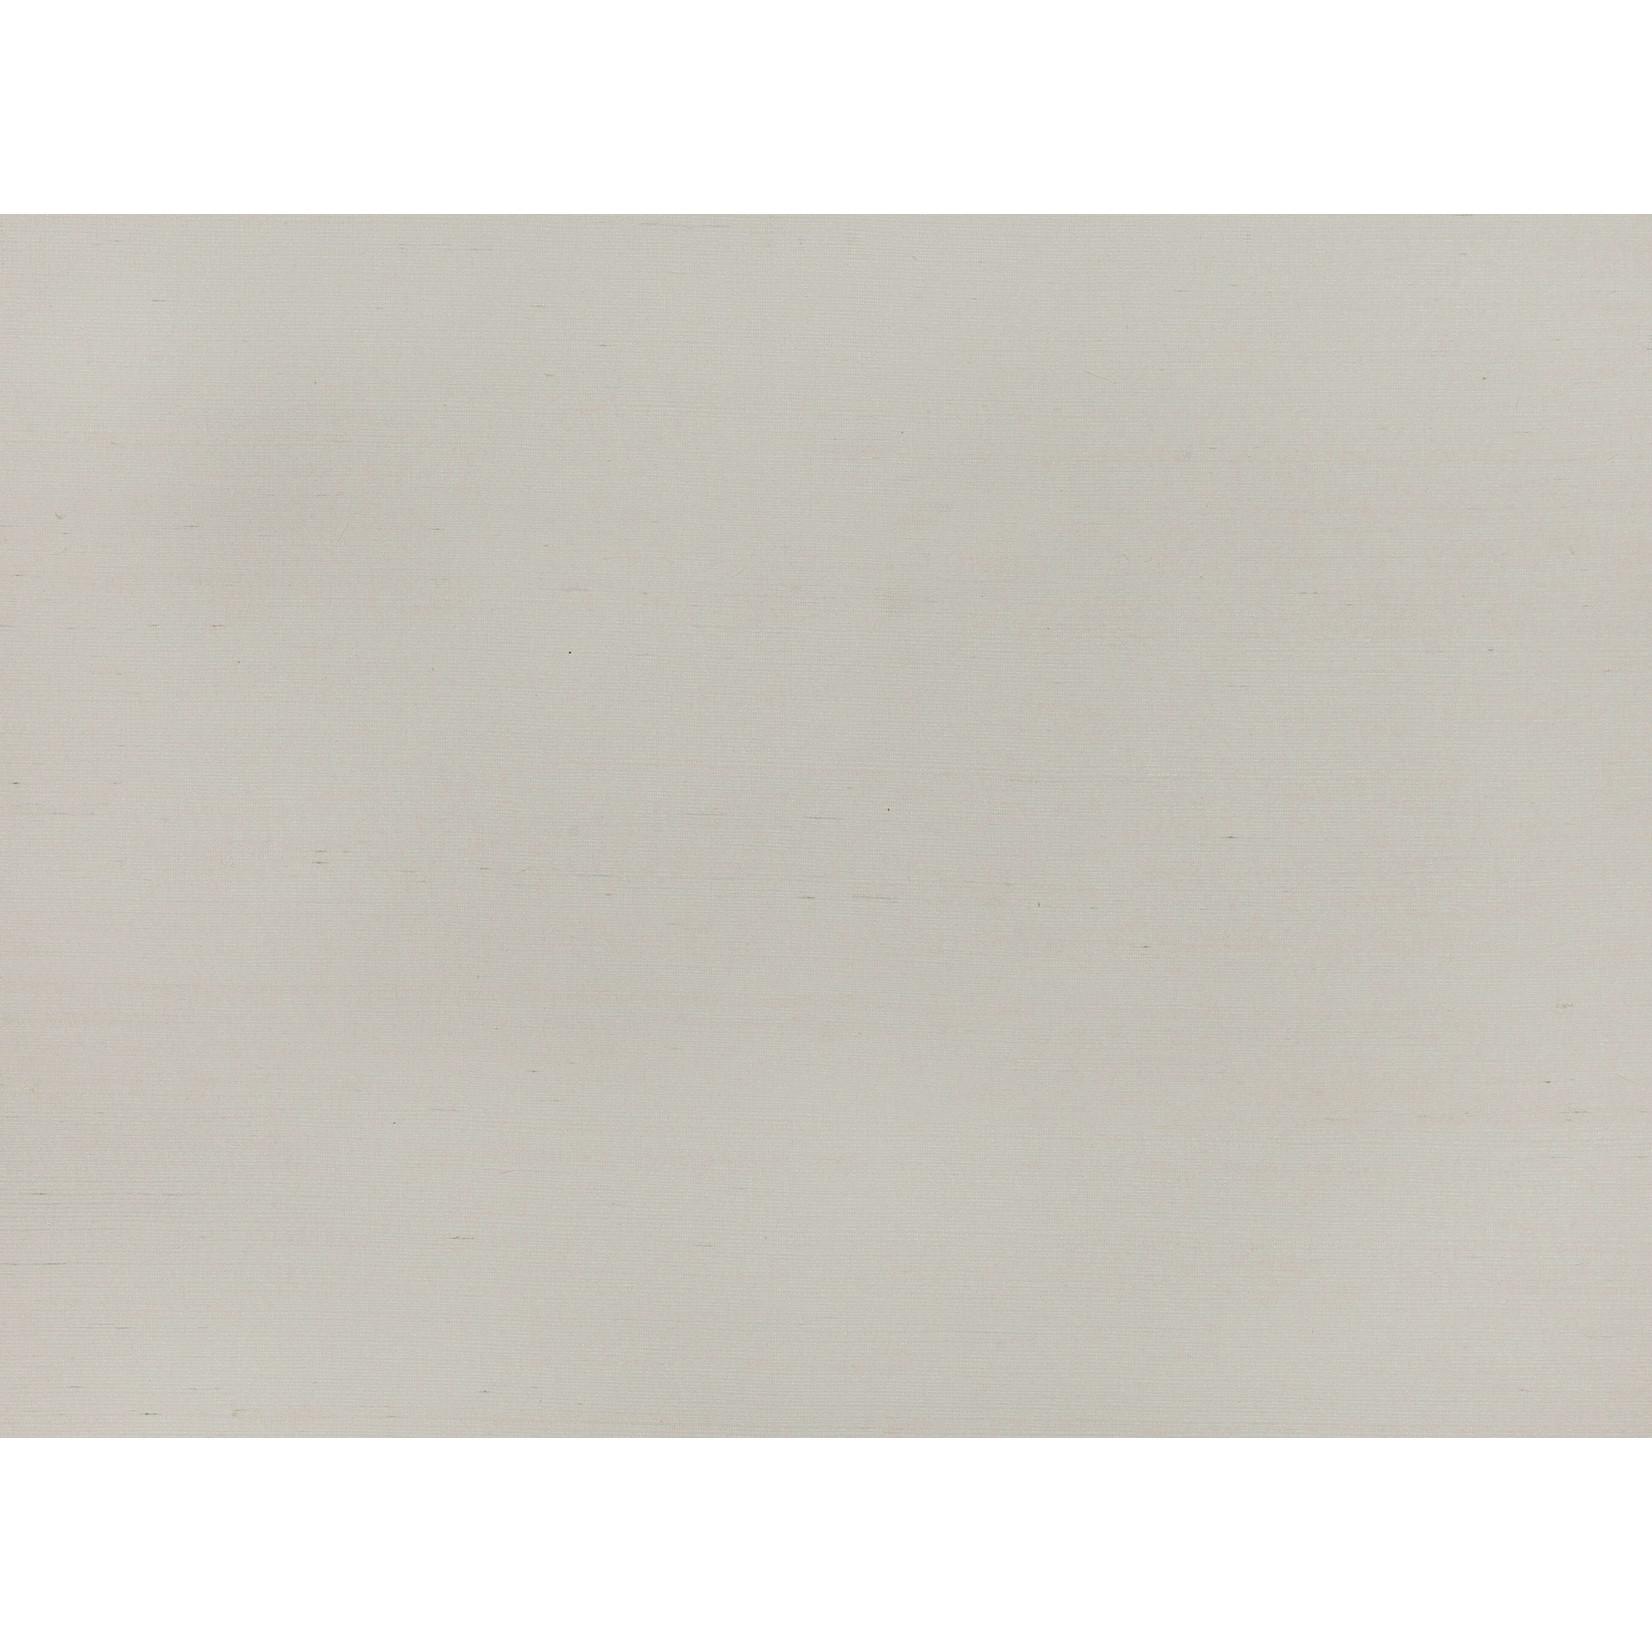 Mark Alexander Grasscloth Handwoven Wallcoverings | Sisal Alabaster